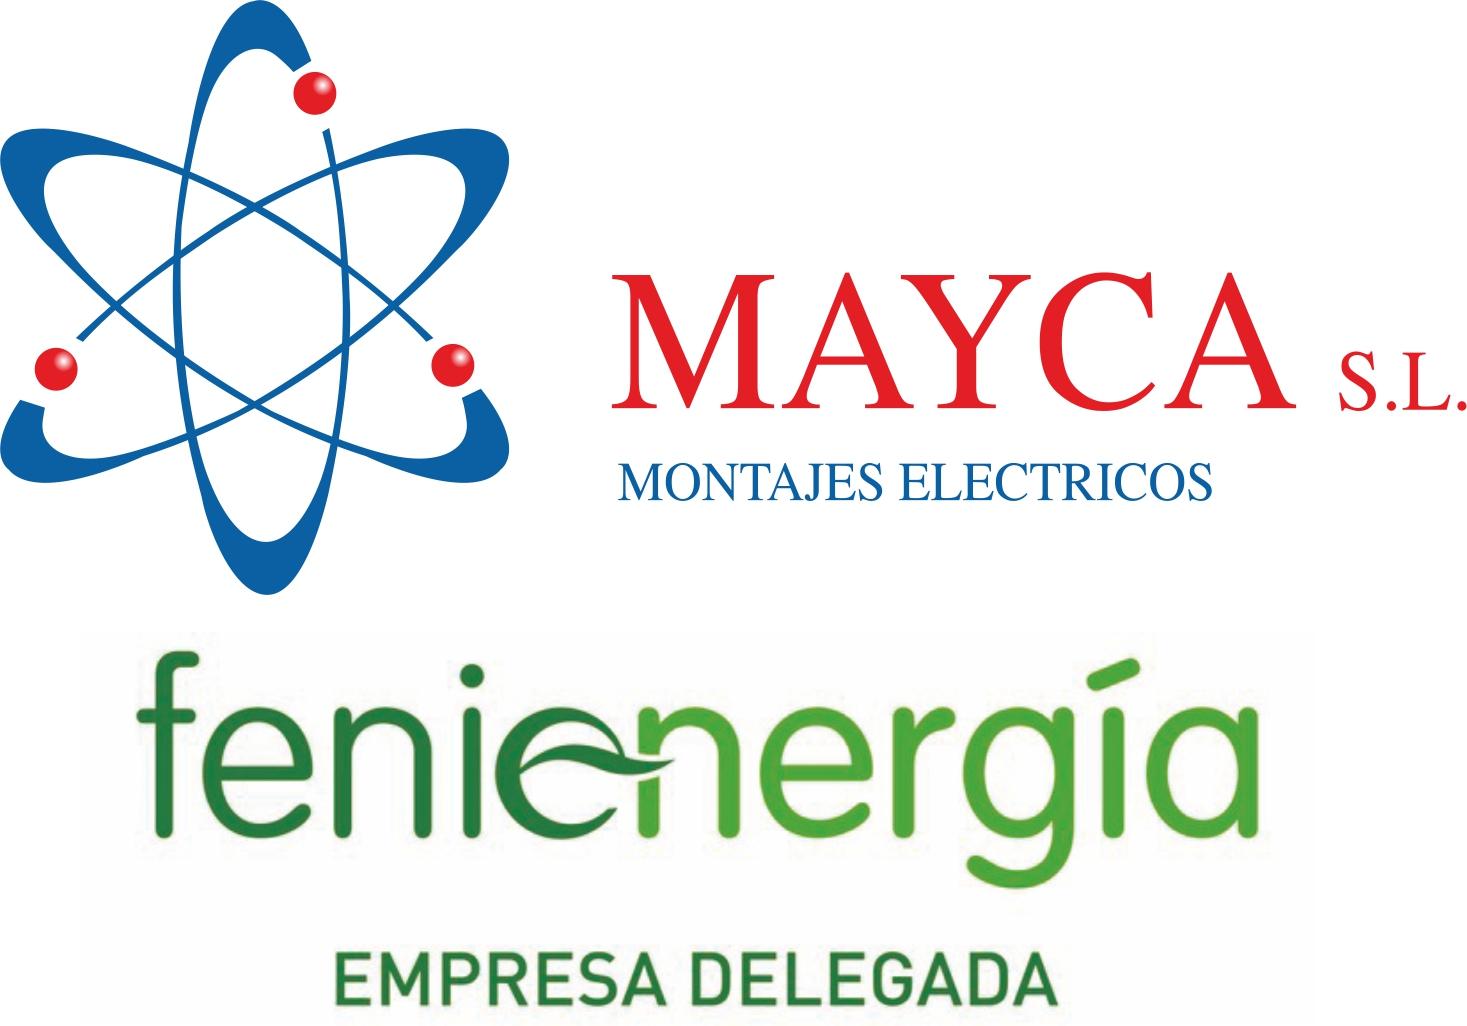 MONTAJES ELÉCTRICOS MAYCA